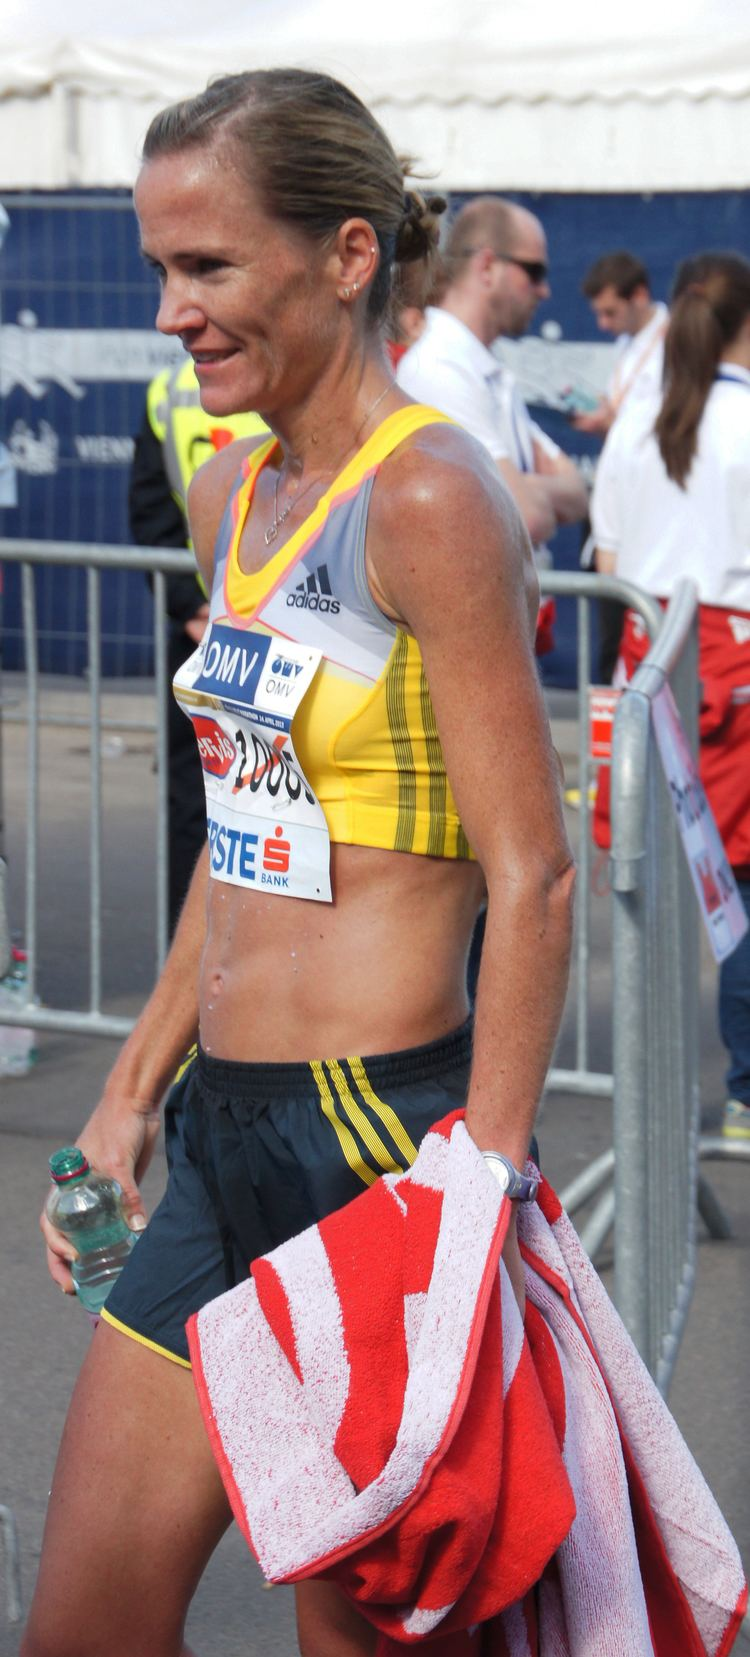 Tanith Maxwell FileVienna 20130414 Vienna City Marathon 10005 Tanith